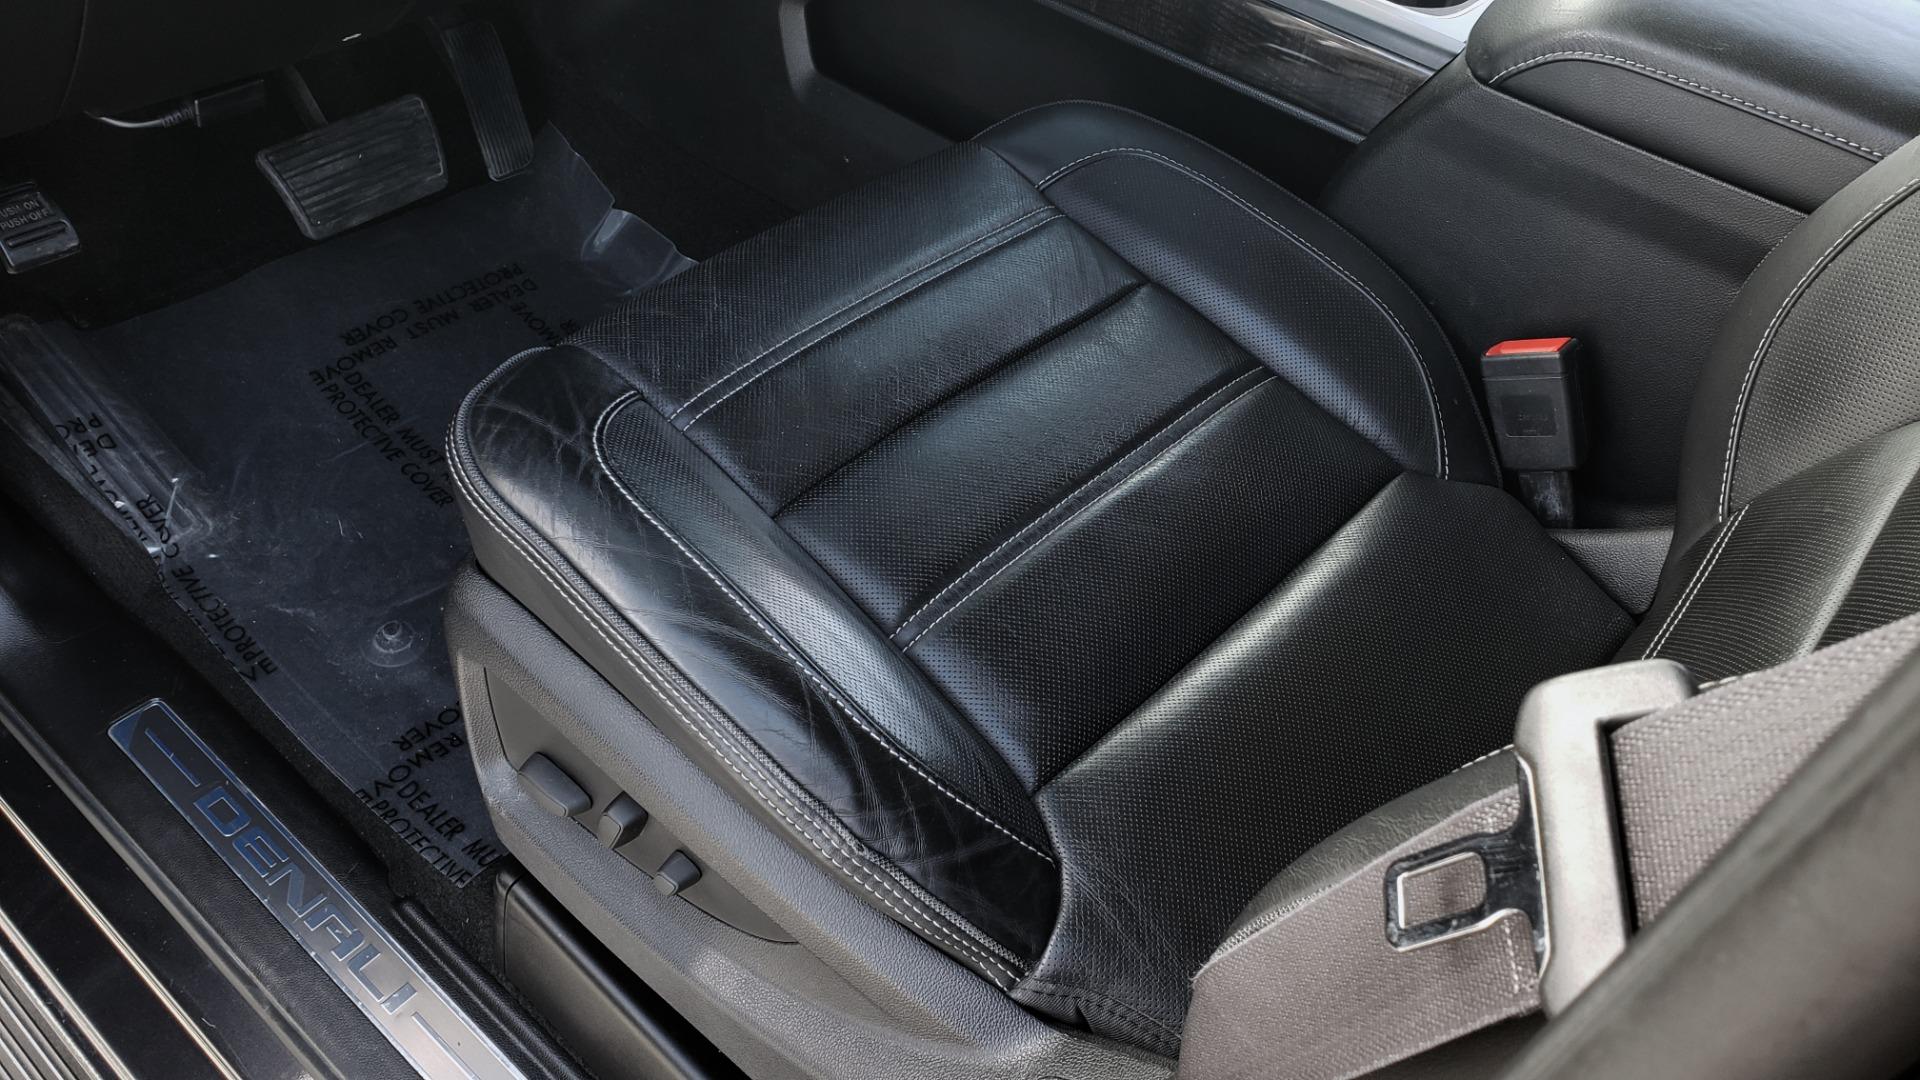 Used 2015 GMC SIERRA 2500HD DENALI 4WD CREWCAB / 6.6L DURAMAX / 6-SPD AUTO / NAV / BOSE for sale $50,995 at Formula Imports in Charlotte NC 28227 38